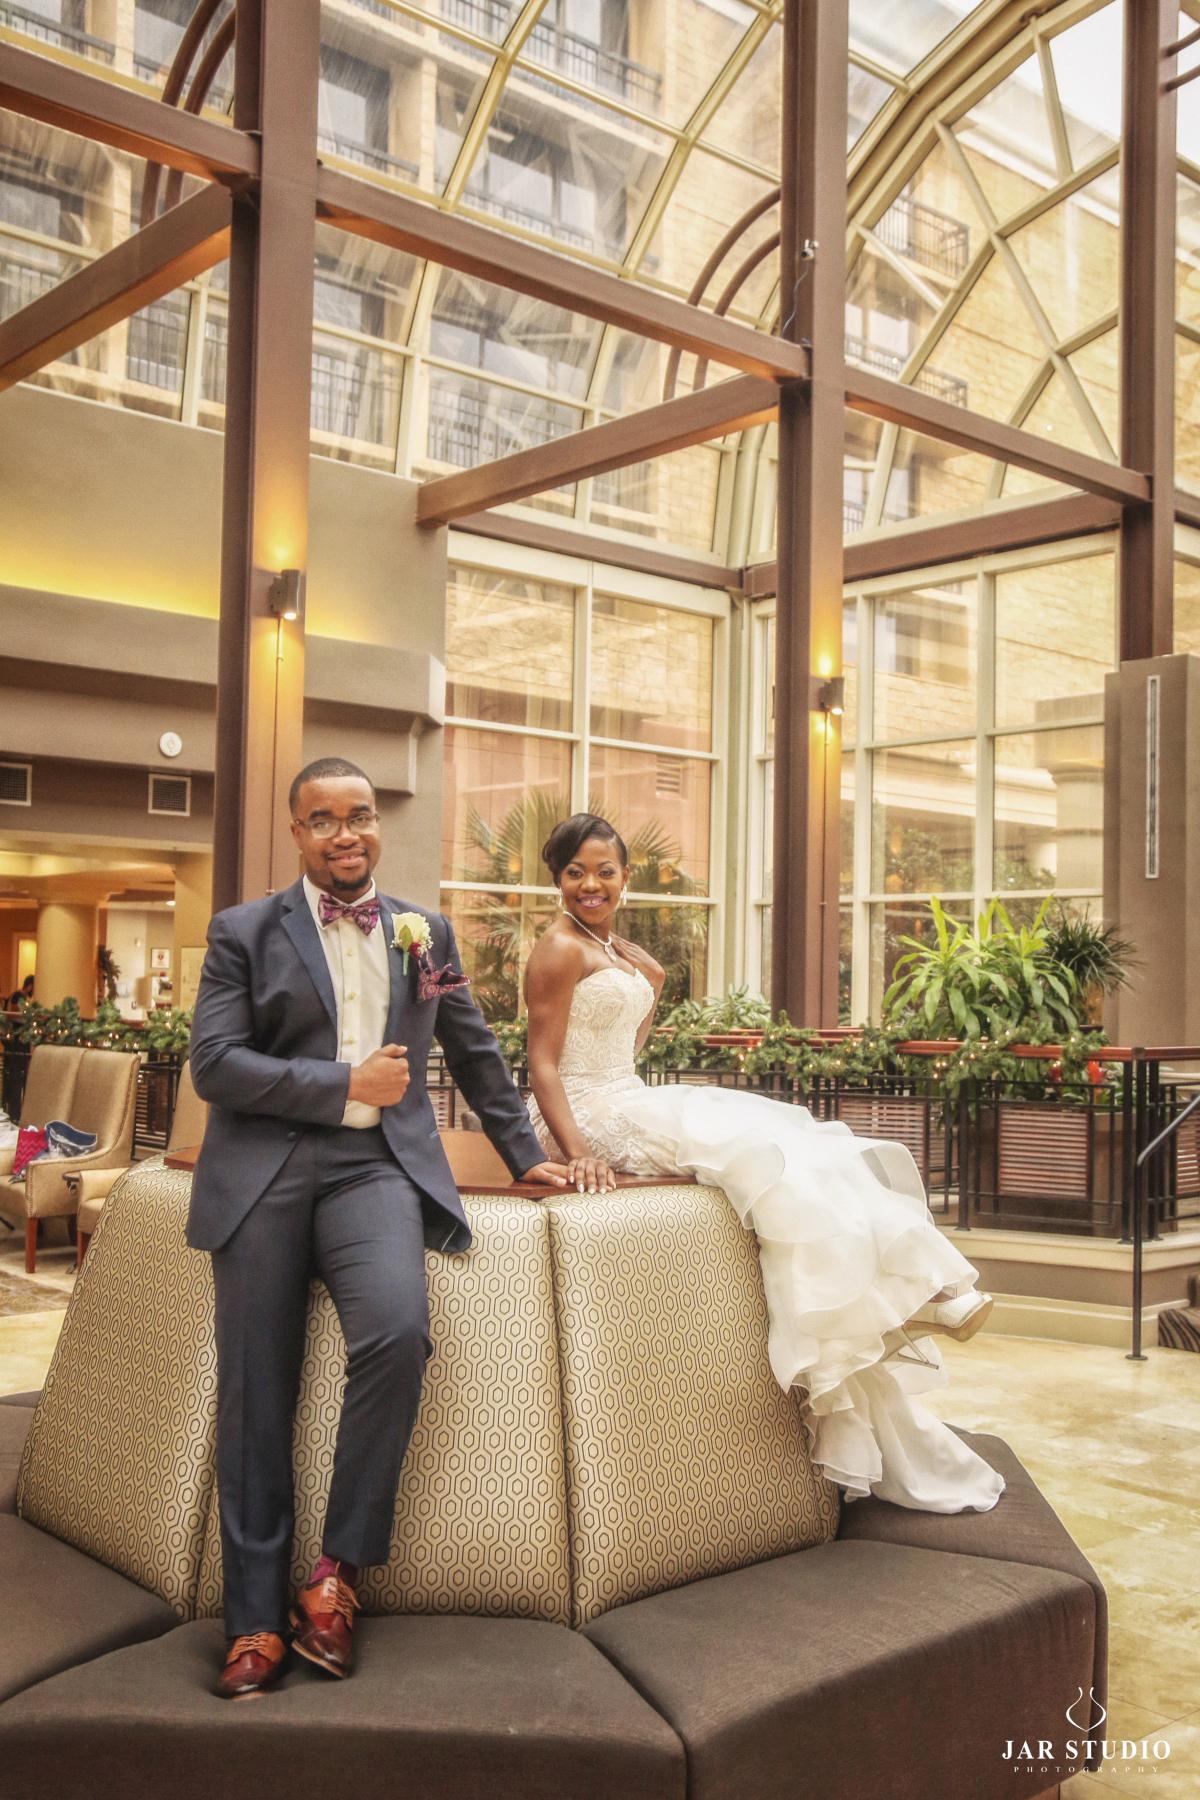 17-sheraton-wedding-photographer-jarstudio.JPG